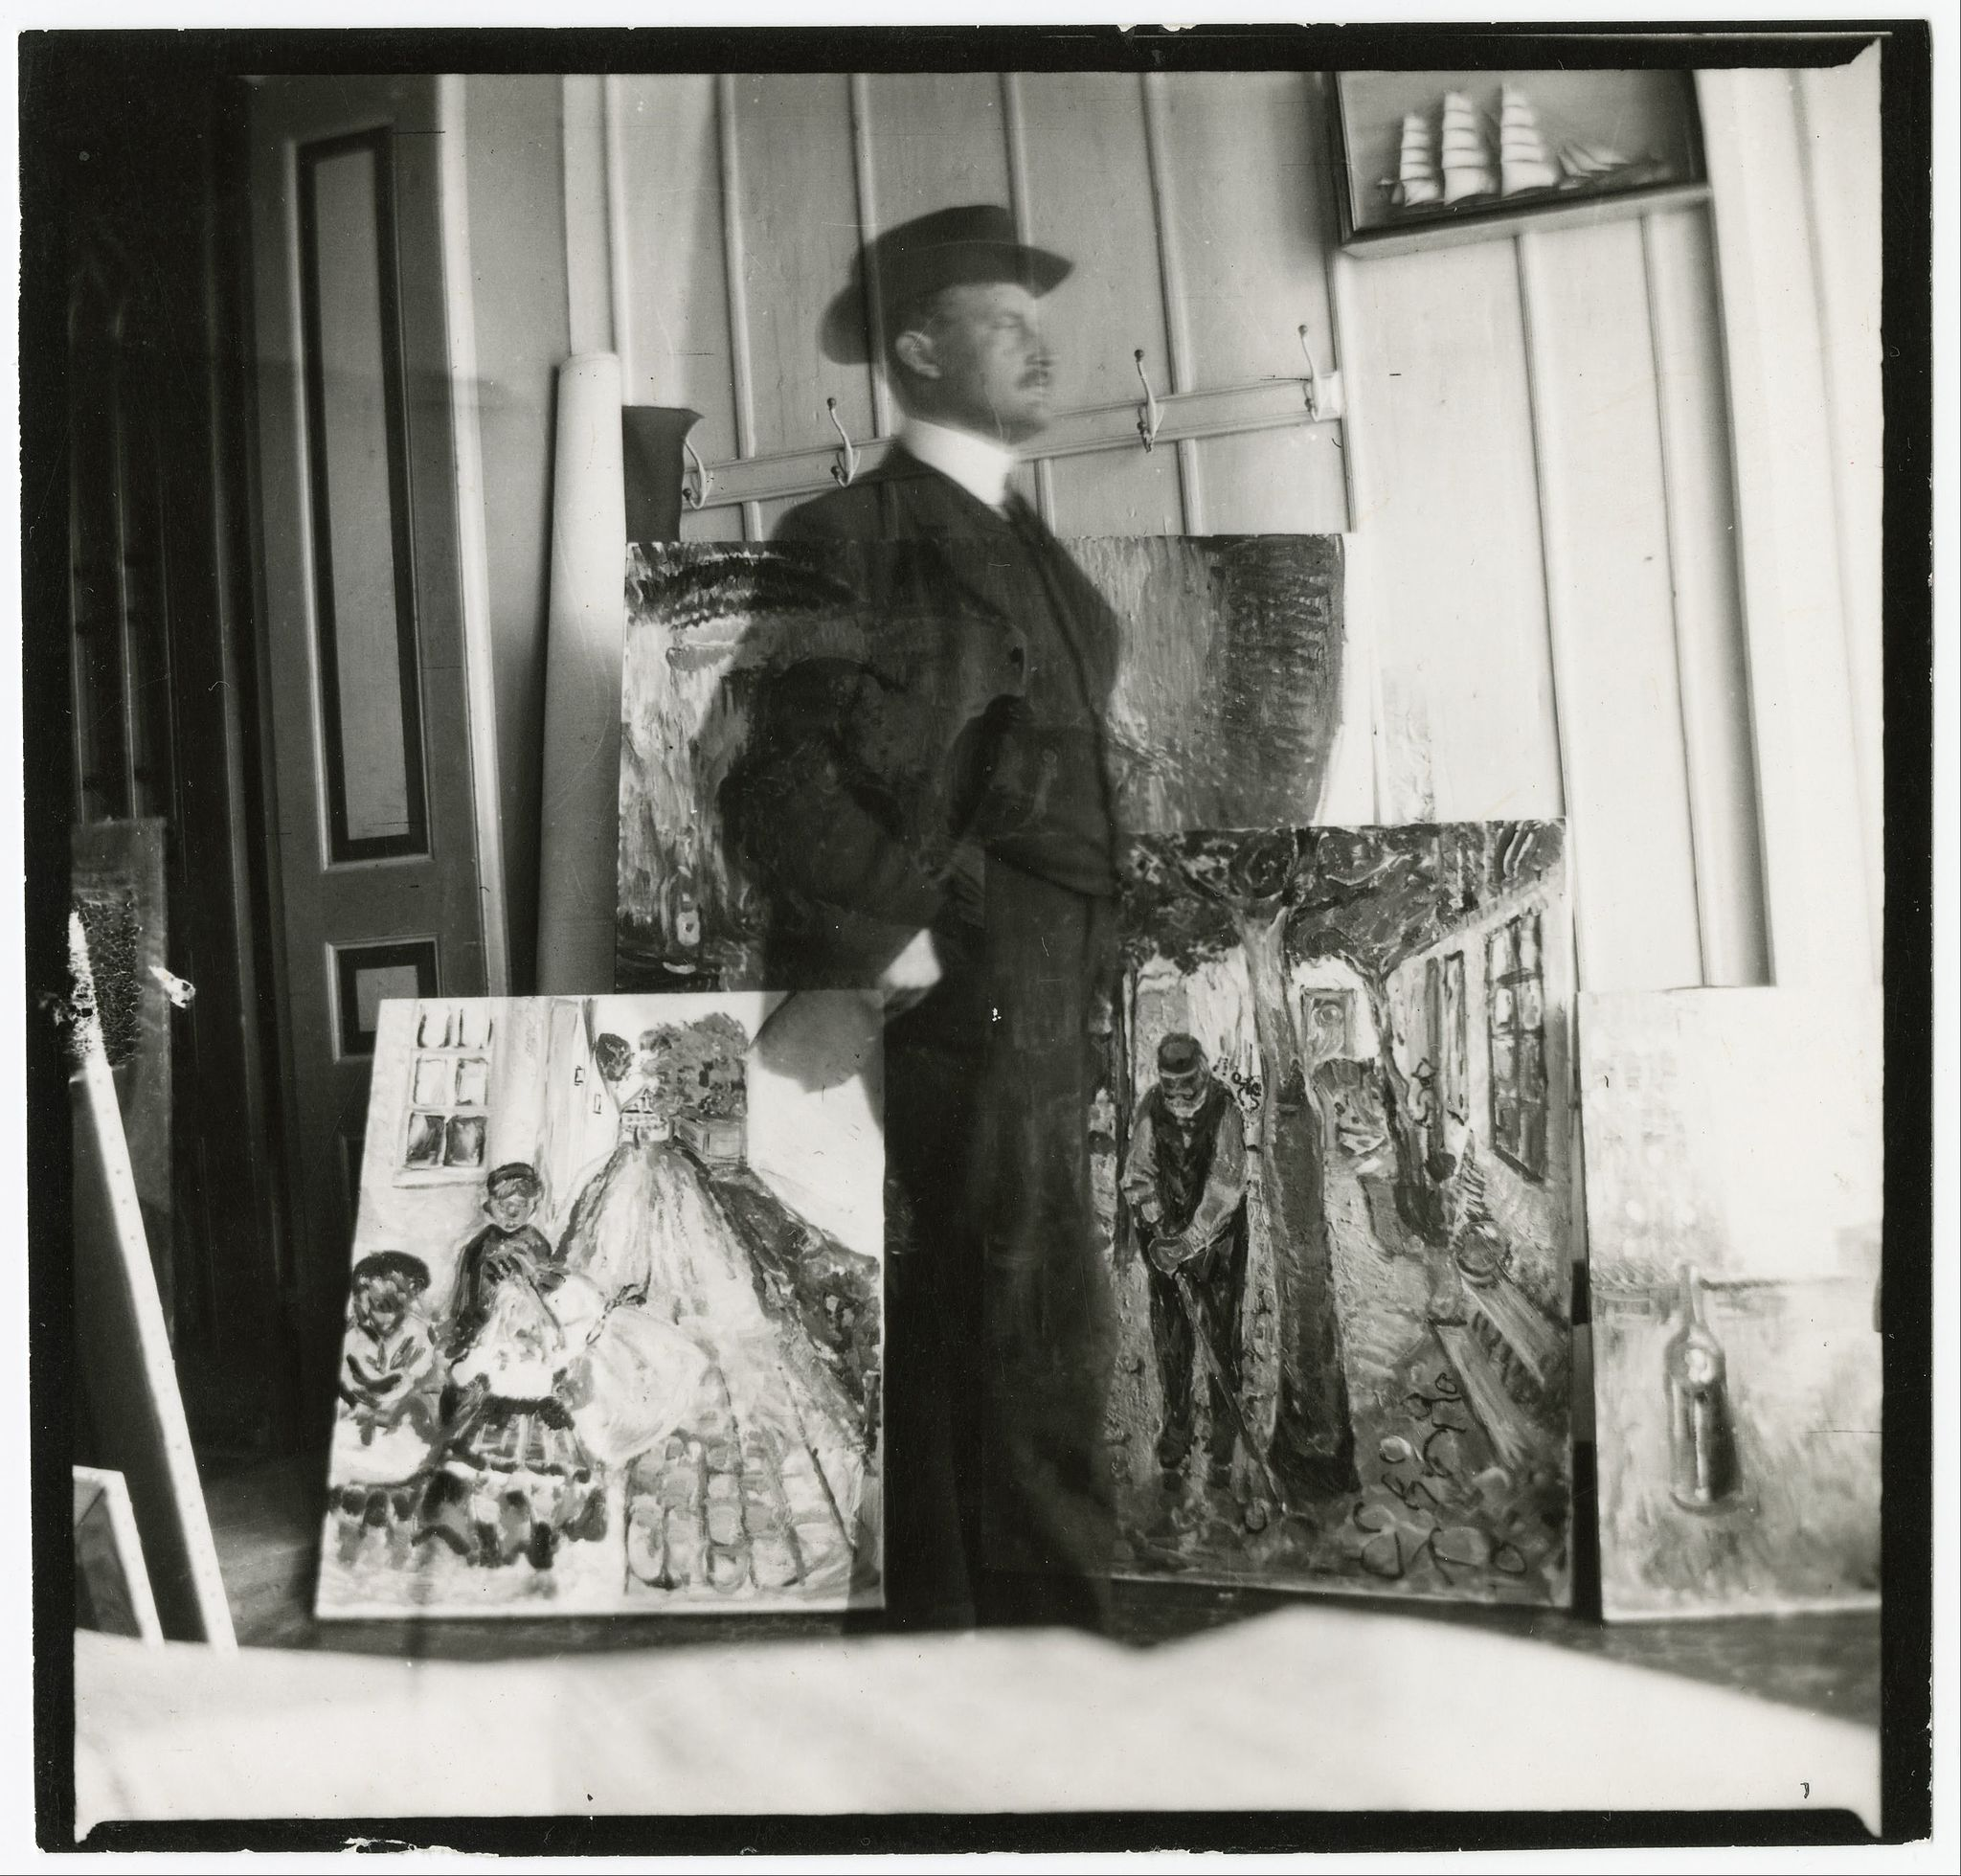 Edvard Munch,  Self Portrait , 1907. Gelatin silver print, 9 x 9.4 cm. Munch Museum/Munch-Elingsen Group/BONO 2011.